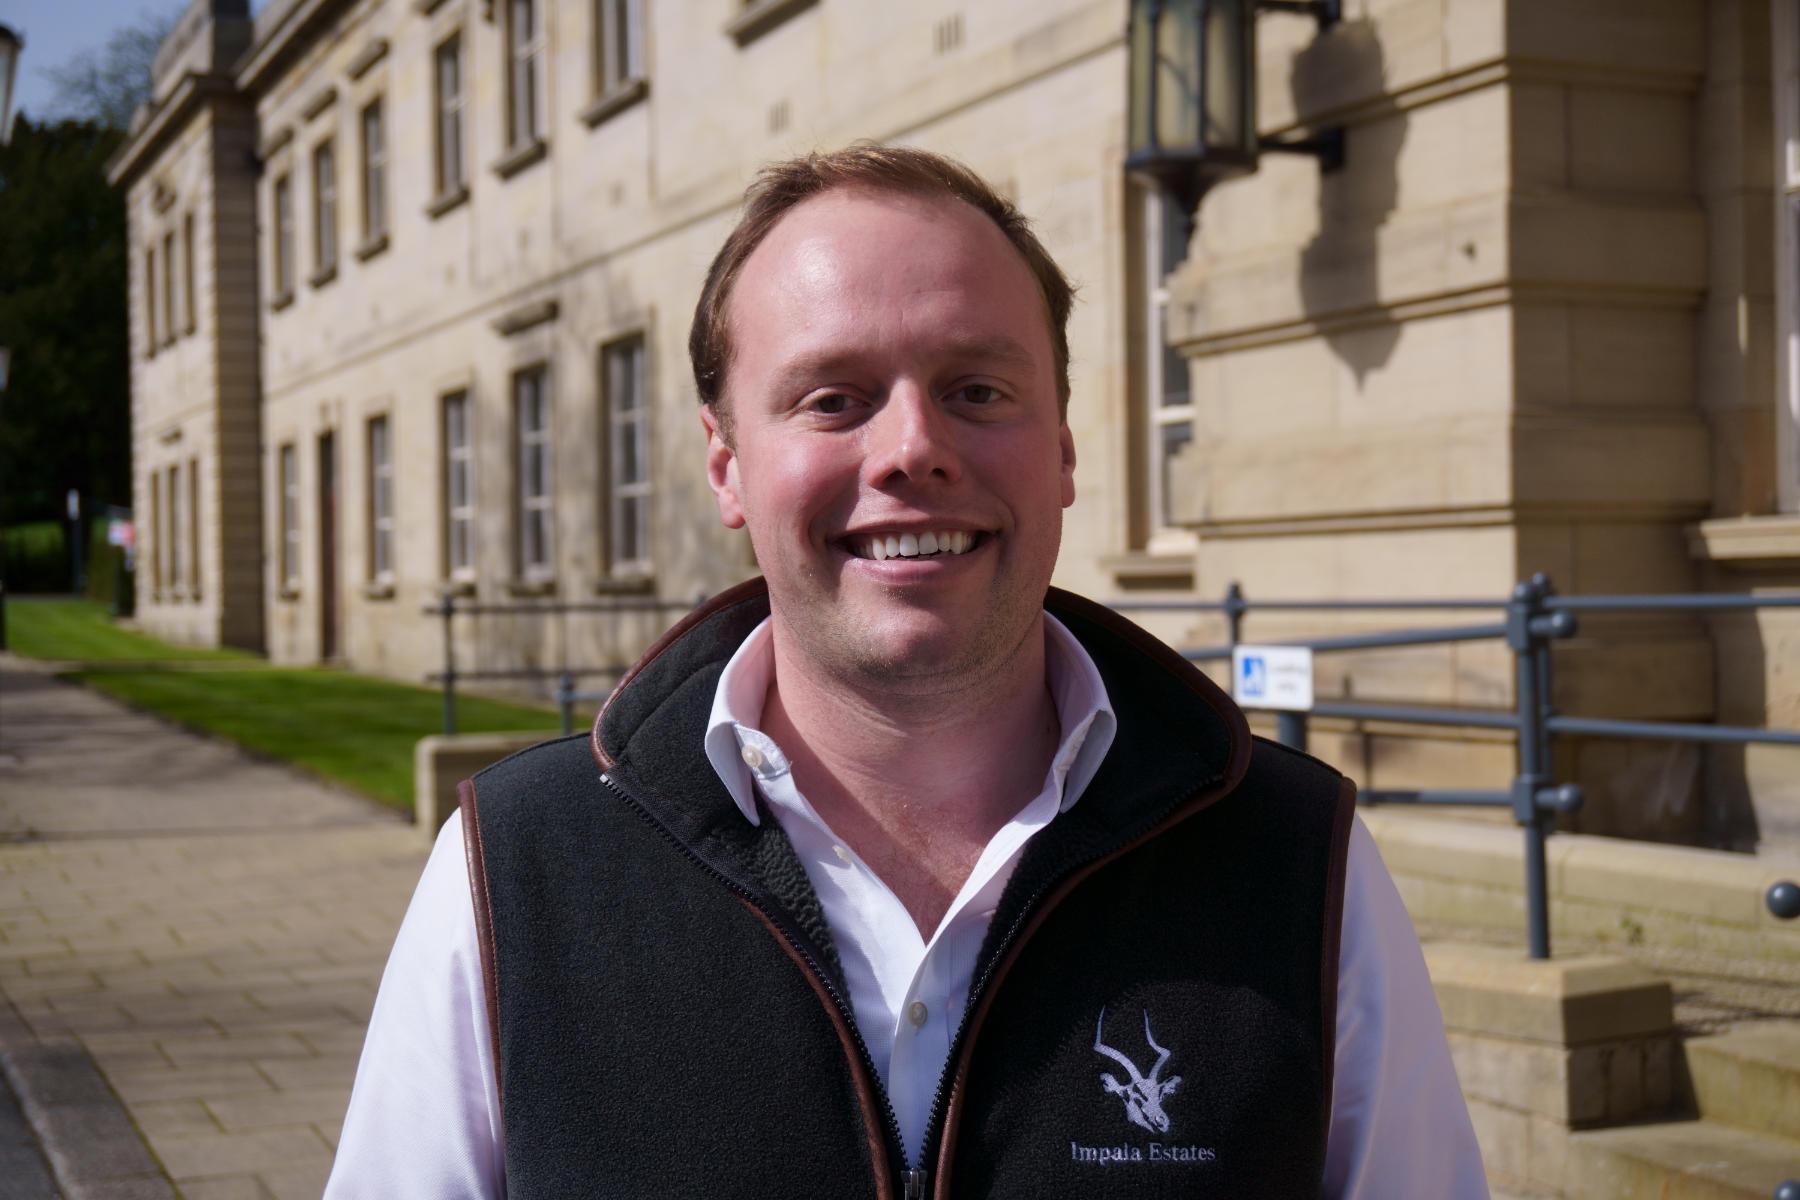 James Hartley from Impala Estates